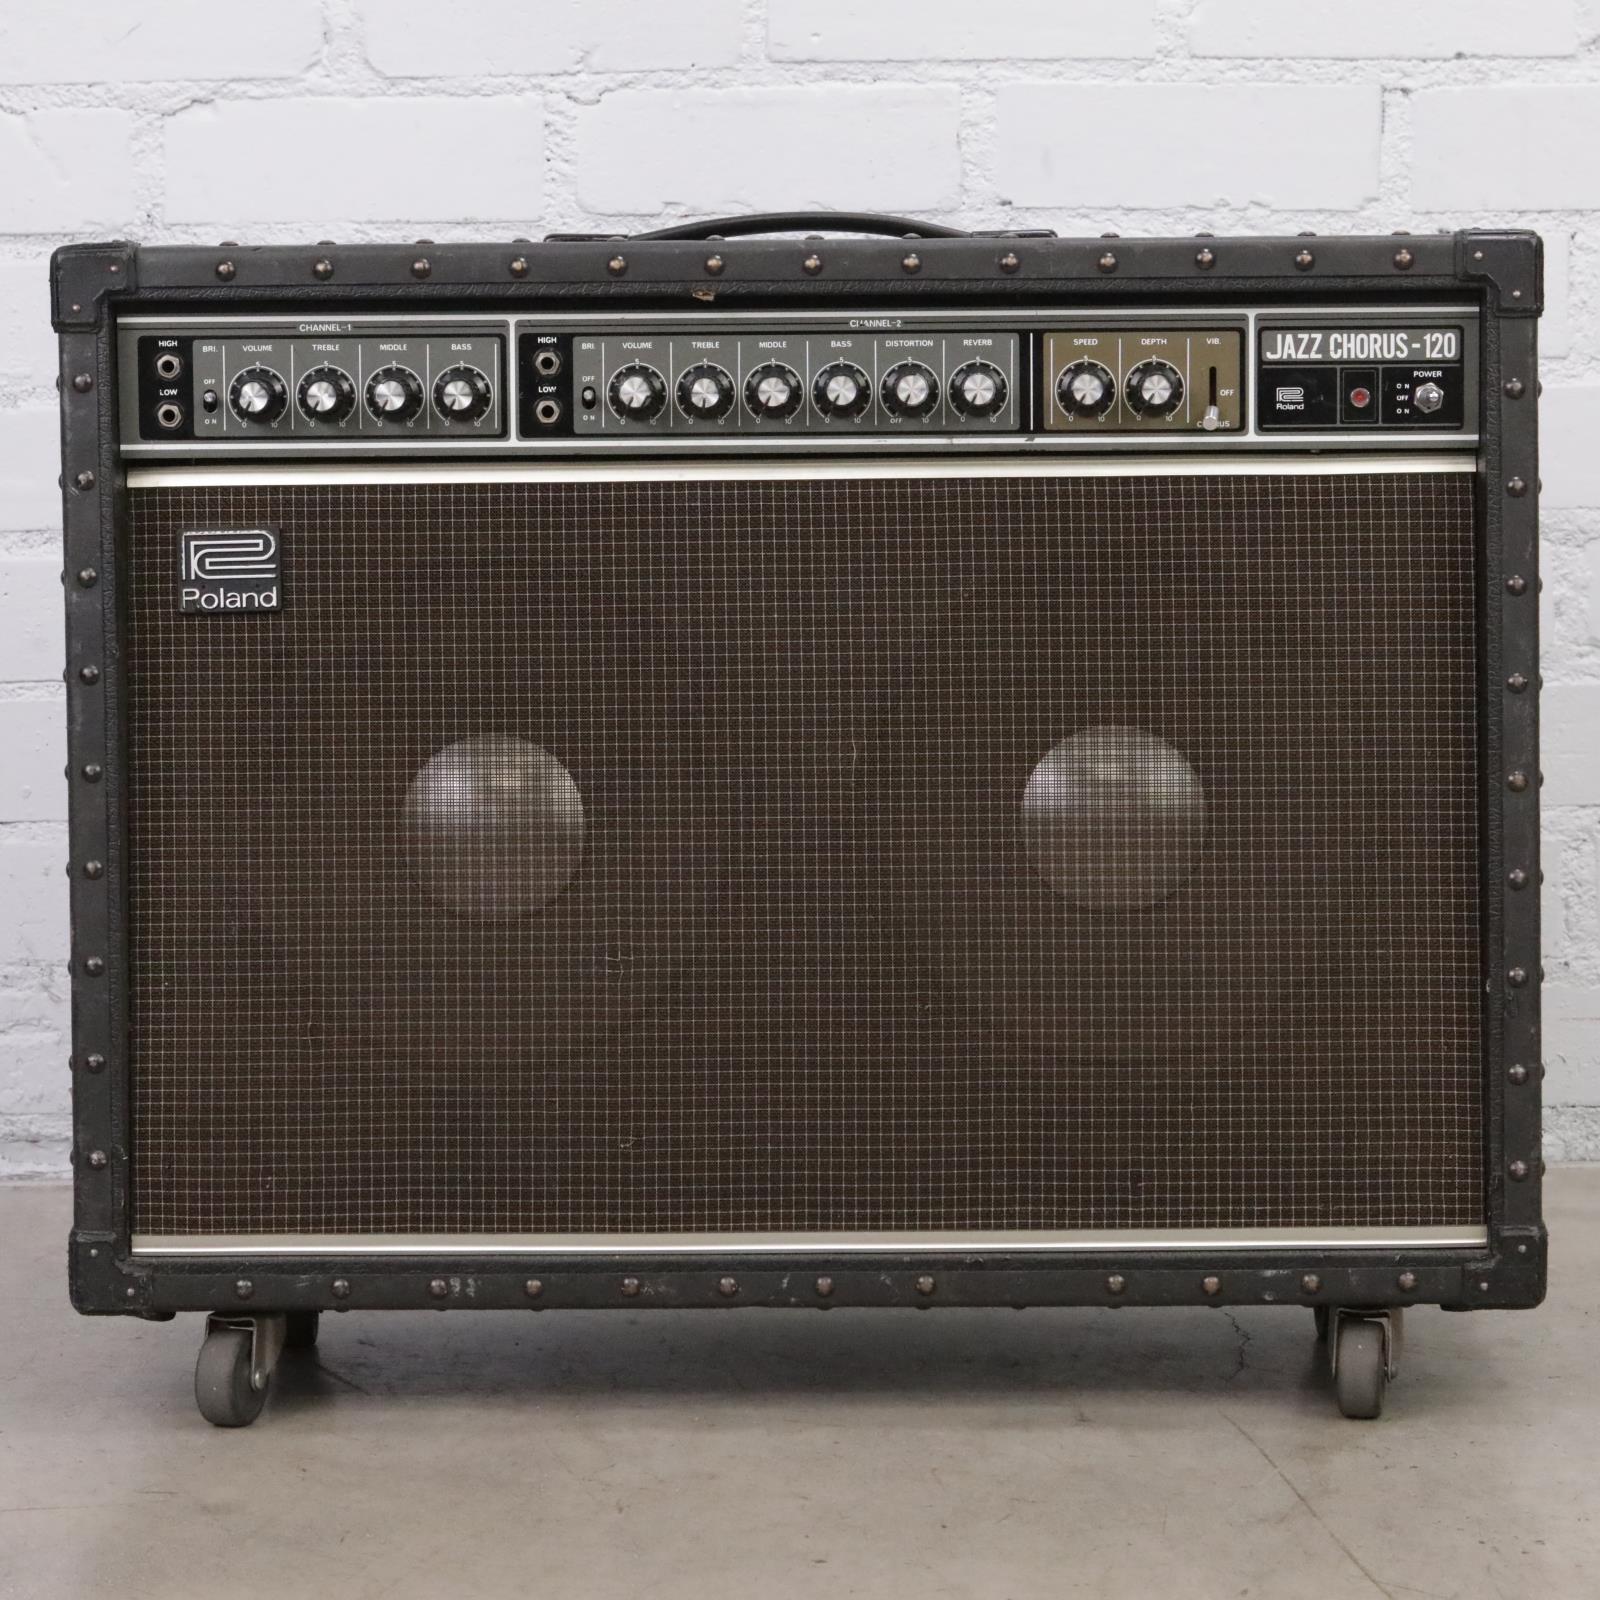 "1980's Roland JC-120 Jazz Chorus-120 2x12"" Stereo Combo Amp w/ JBL E120-8 #44462"